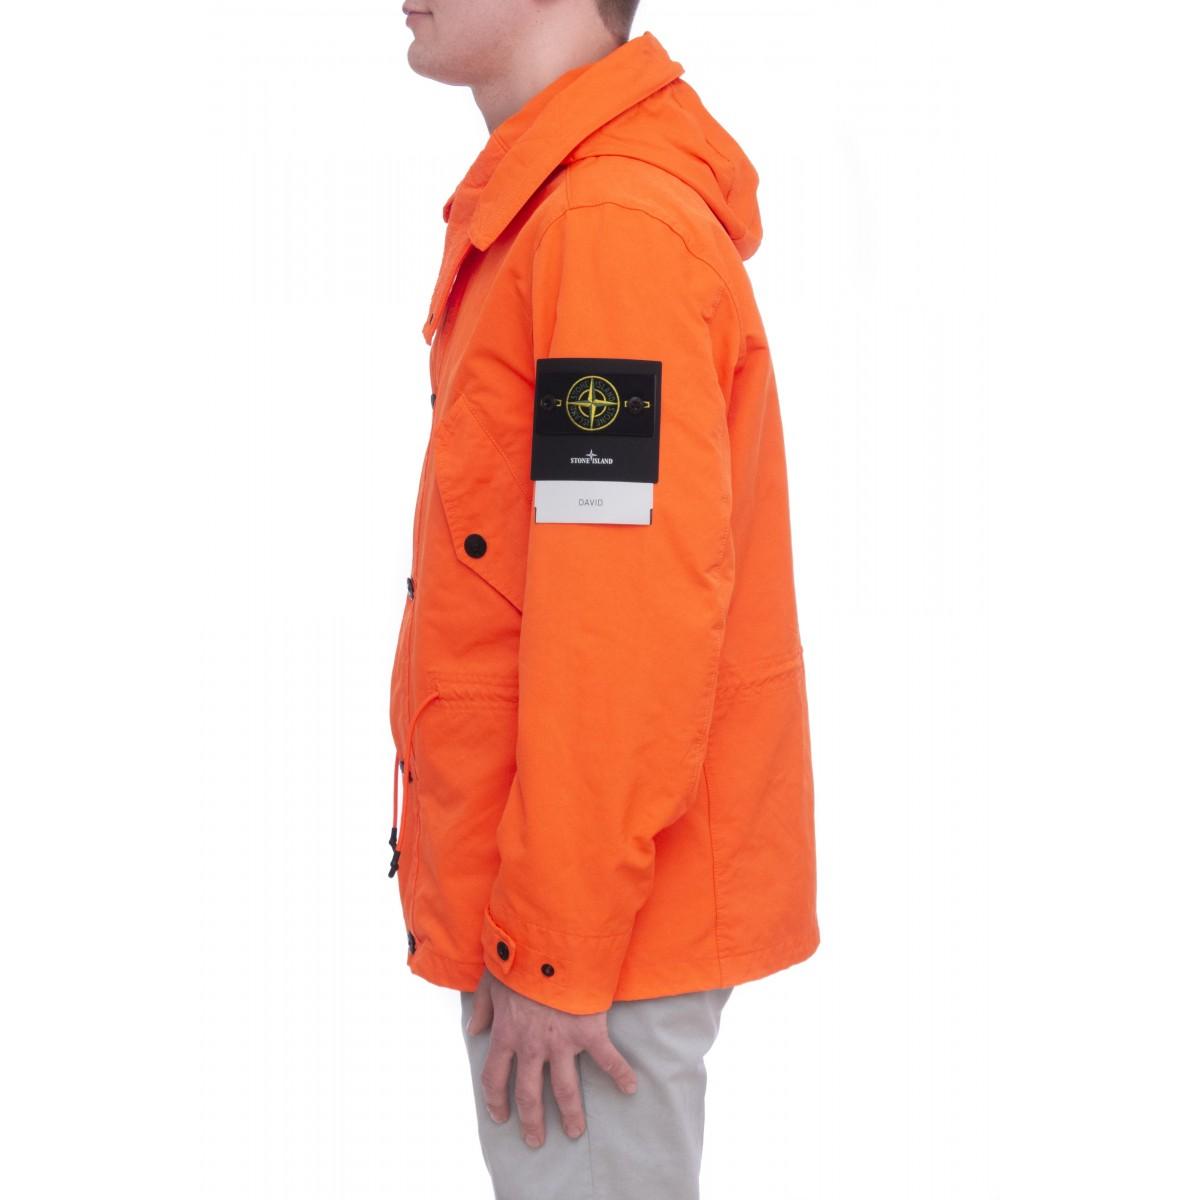 Giubbini - 44448 david arancio limited